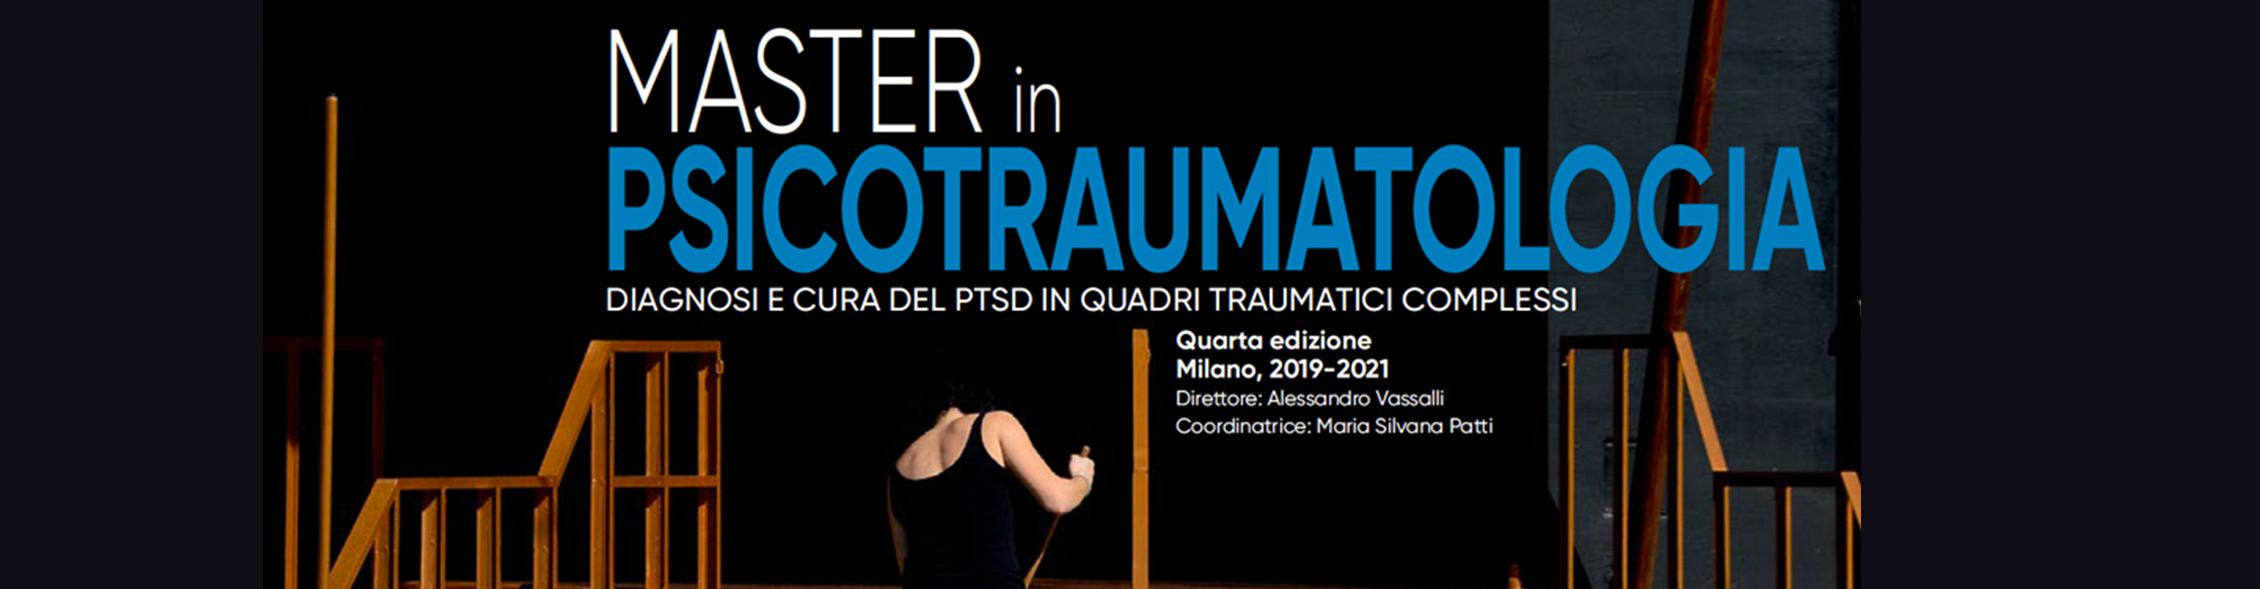 Master in traumatologia - 2019/2021